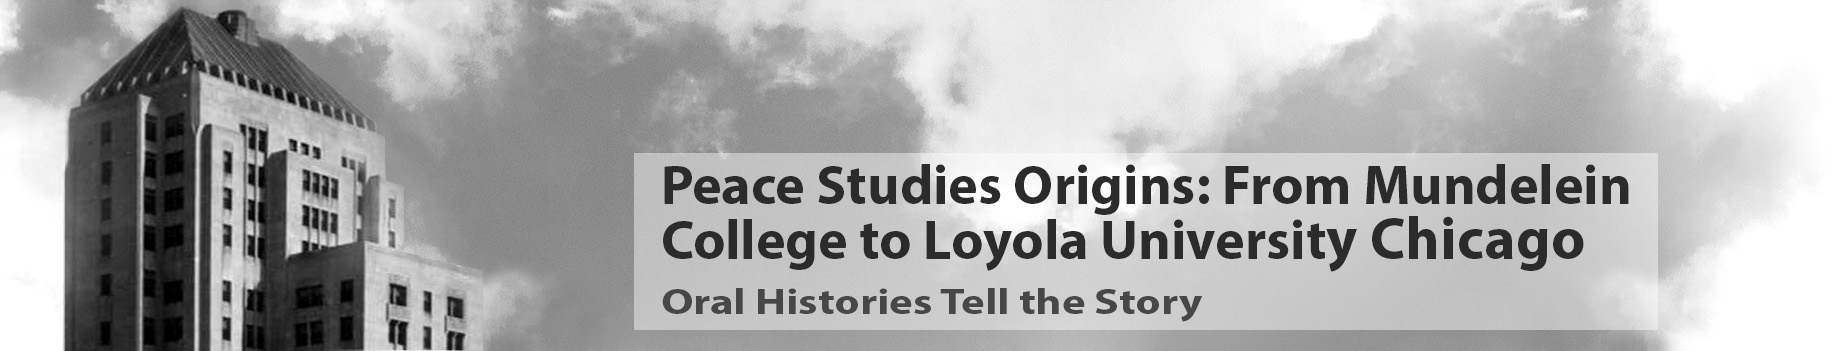 Peace Studies Origins: From Mundelein College to Loyola University Chicago